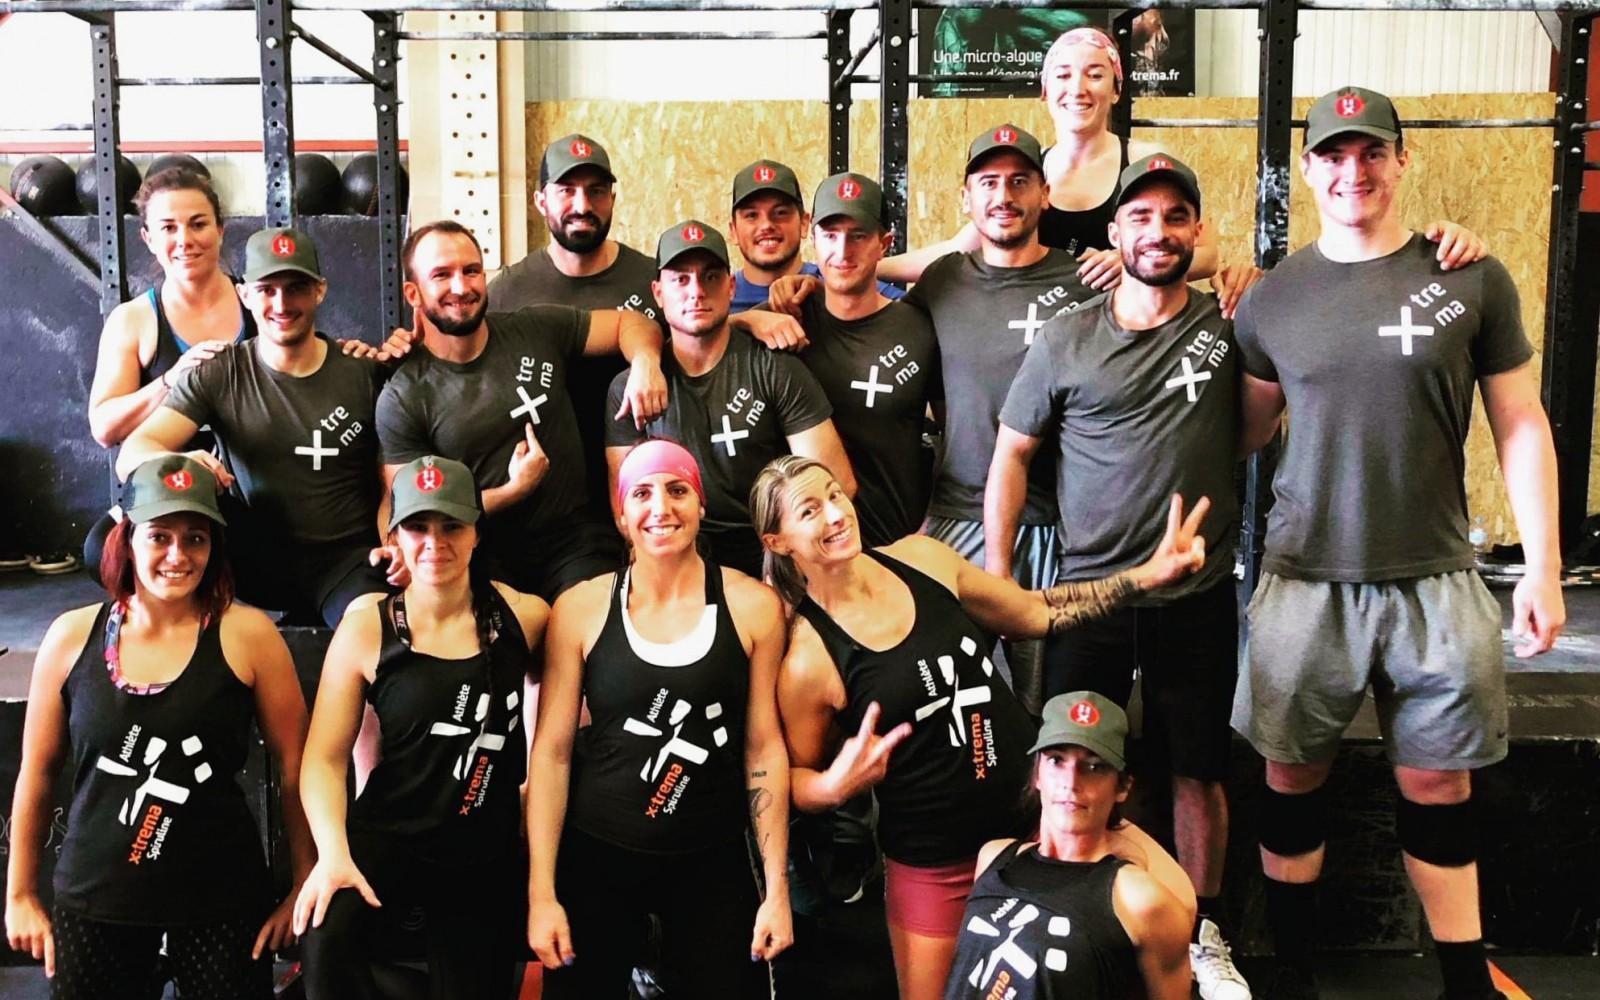 Equipe x:trema lors d'une compétition de crossfit à CrossFit Casteu, en octobre 2020